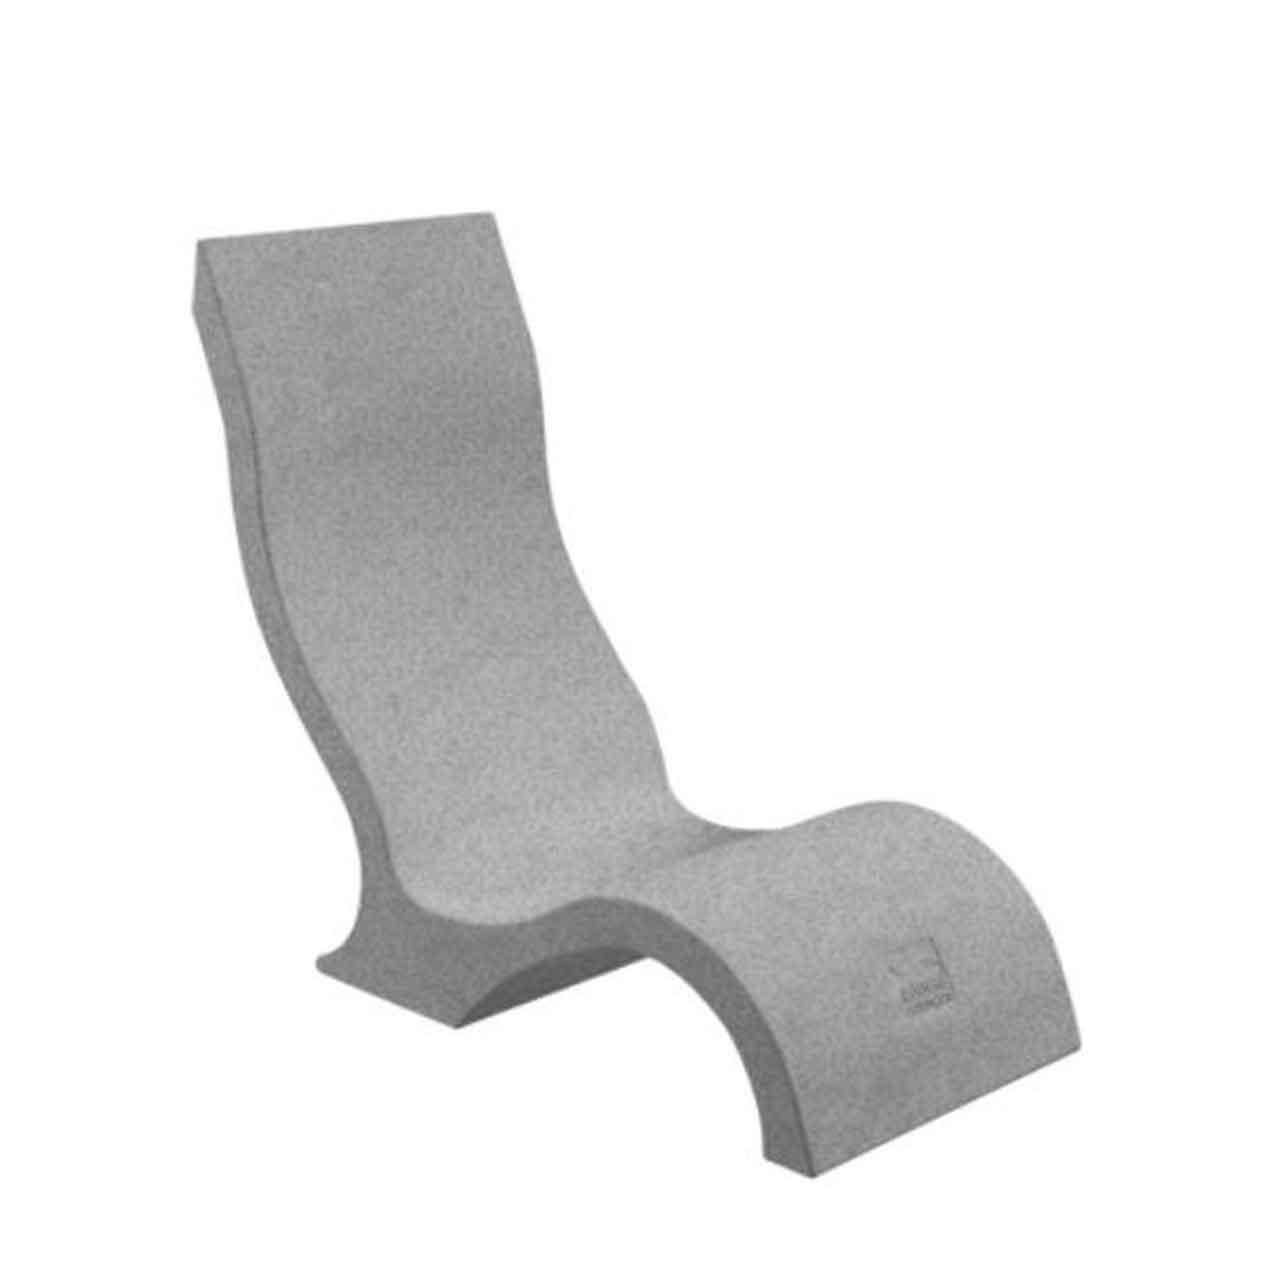 Ledge Lounger In-Pool Chair - Granite Gray